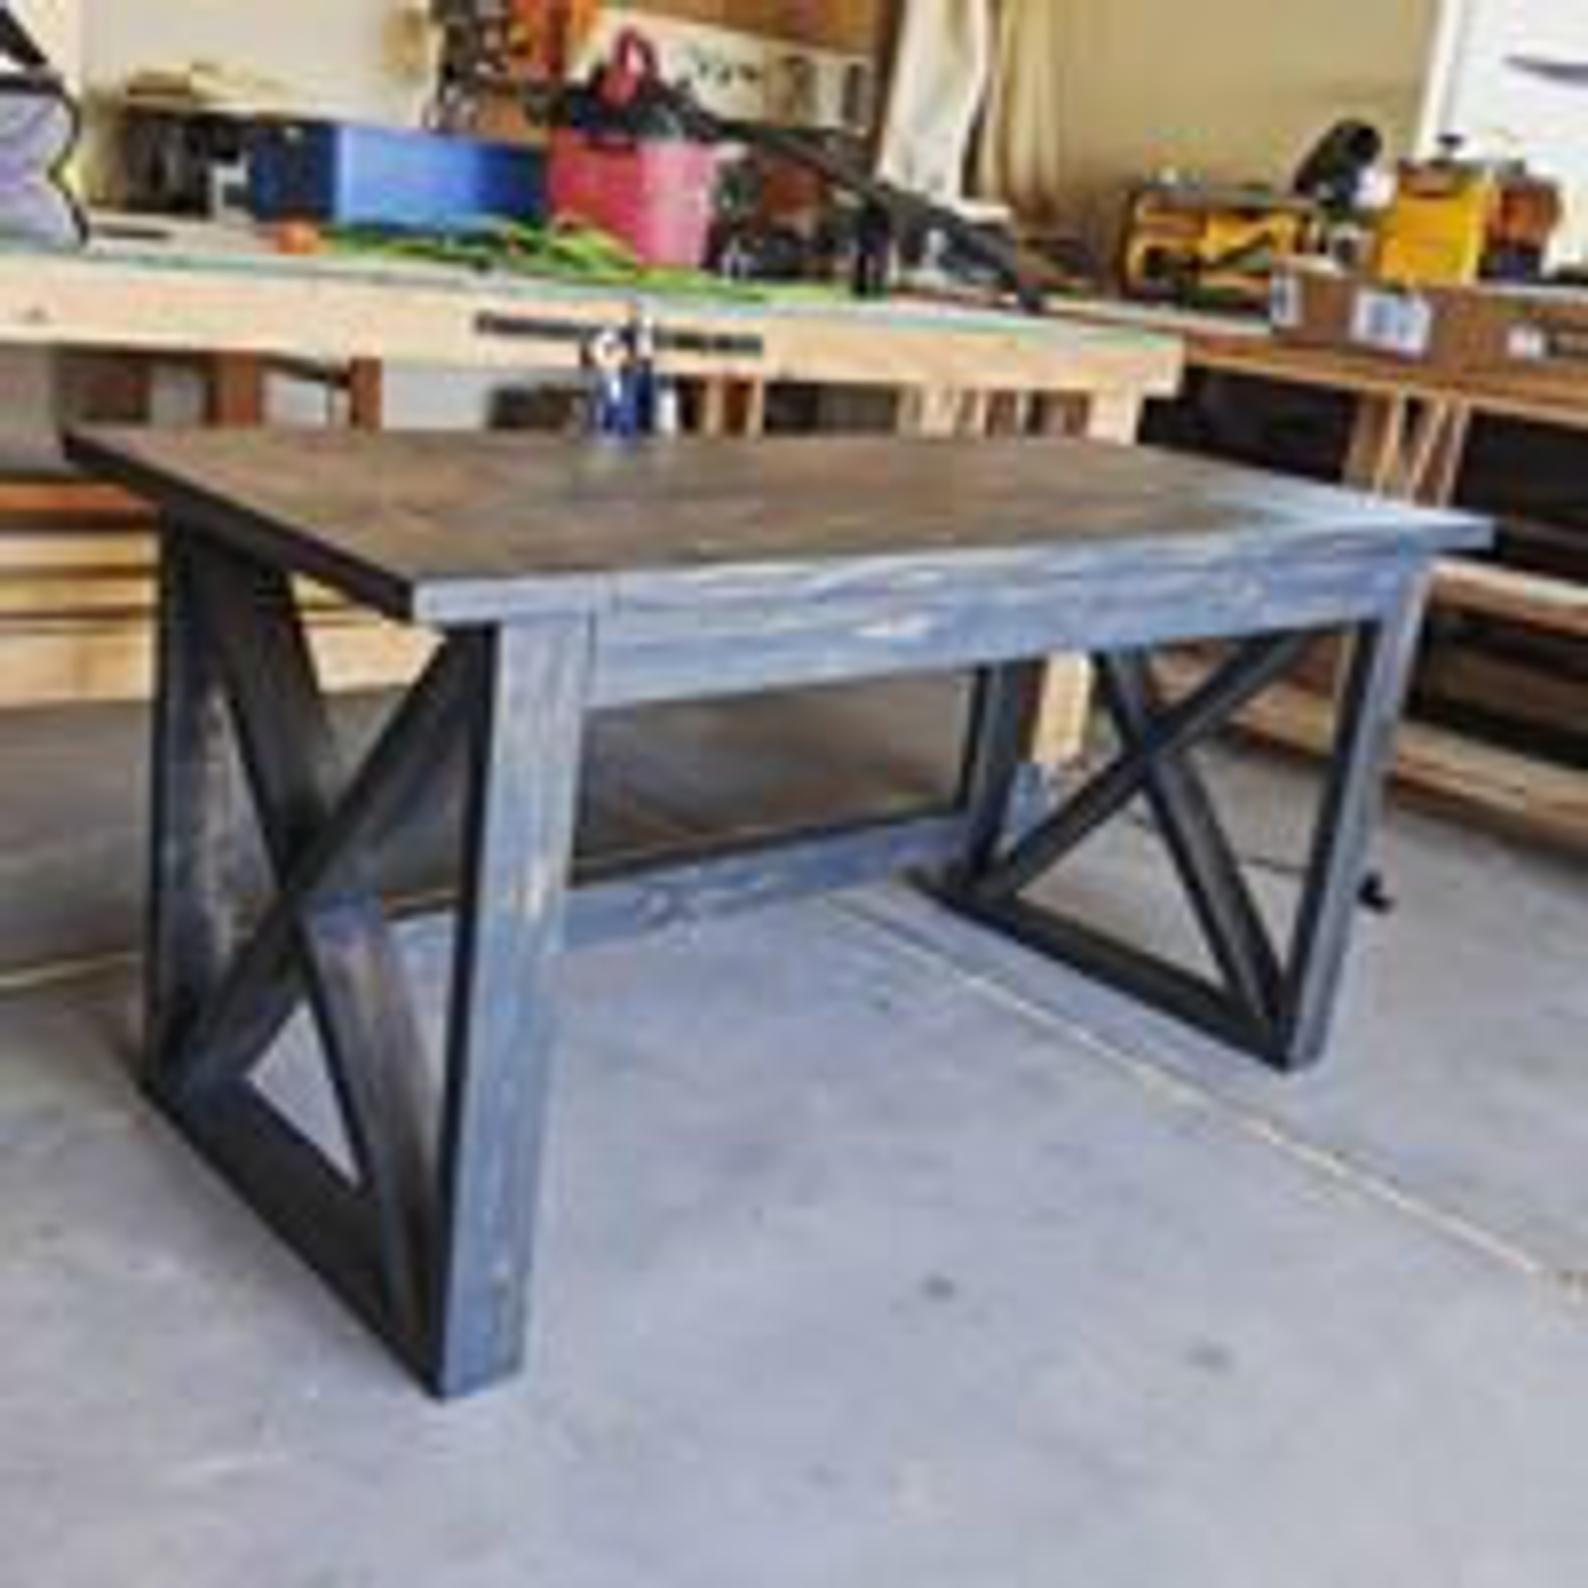 Custom Handmade Rustic Farmhouse Writing Desk Etsy In 2020 Simple Desk Diy Desk Plans Diy Desk